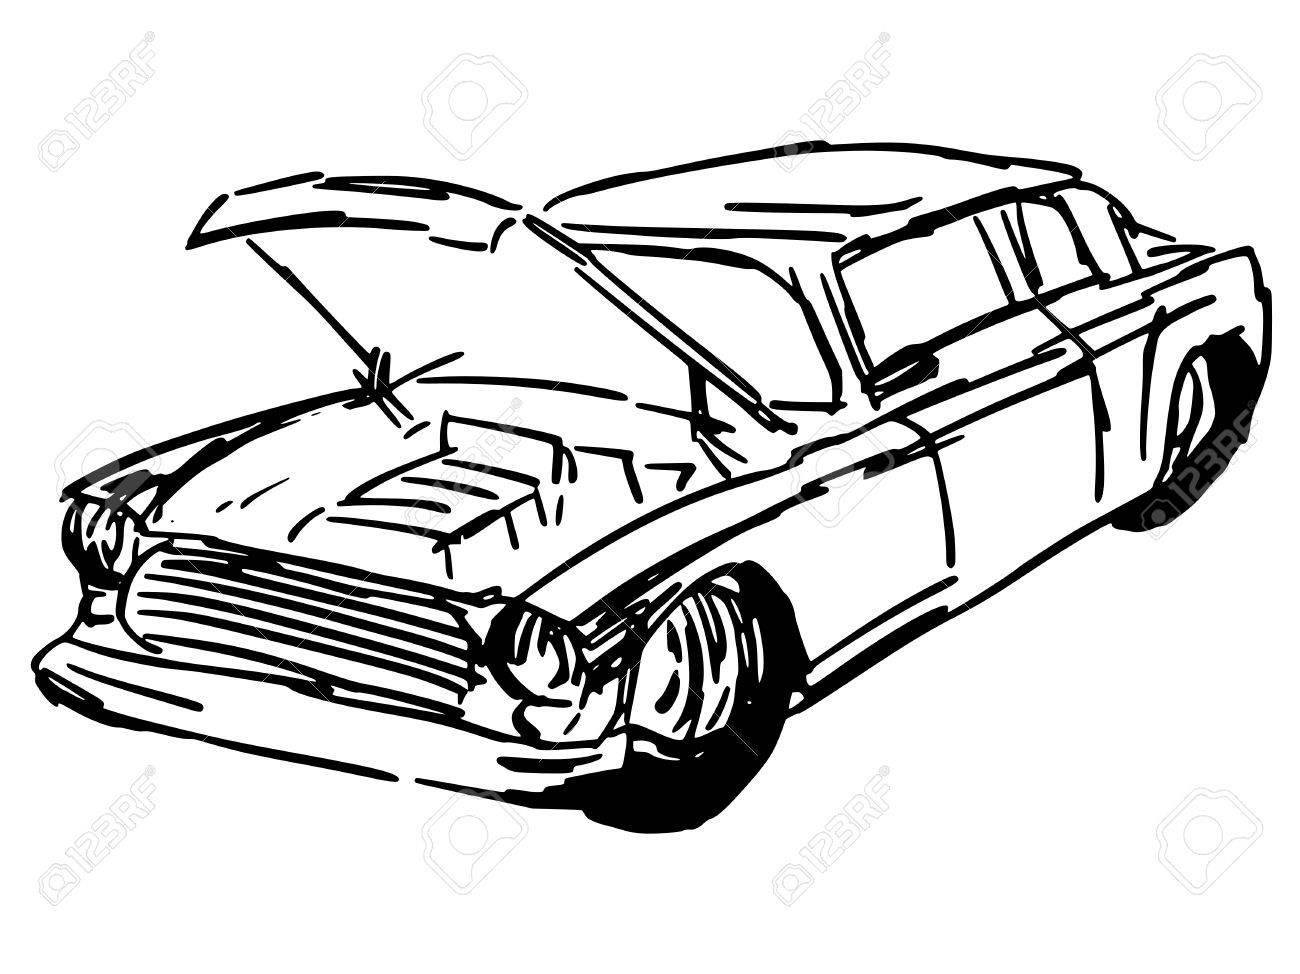 Hand Drawn, Sketch, Cartoon Illustration Of Car Hood Royalty Free ...